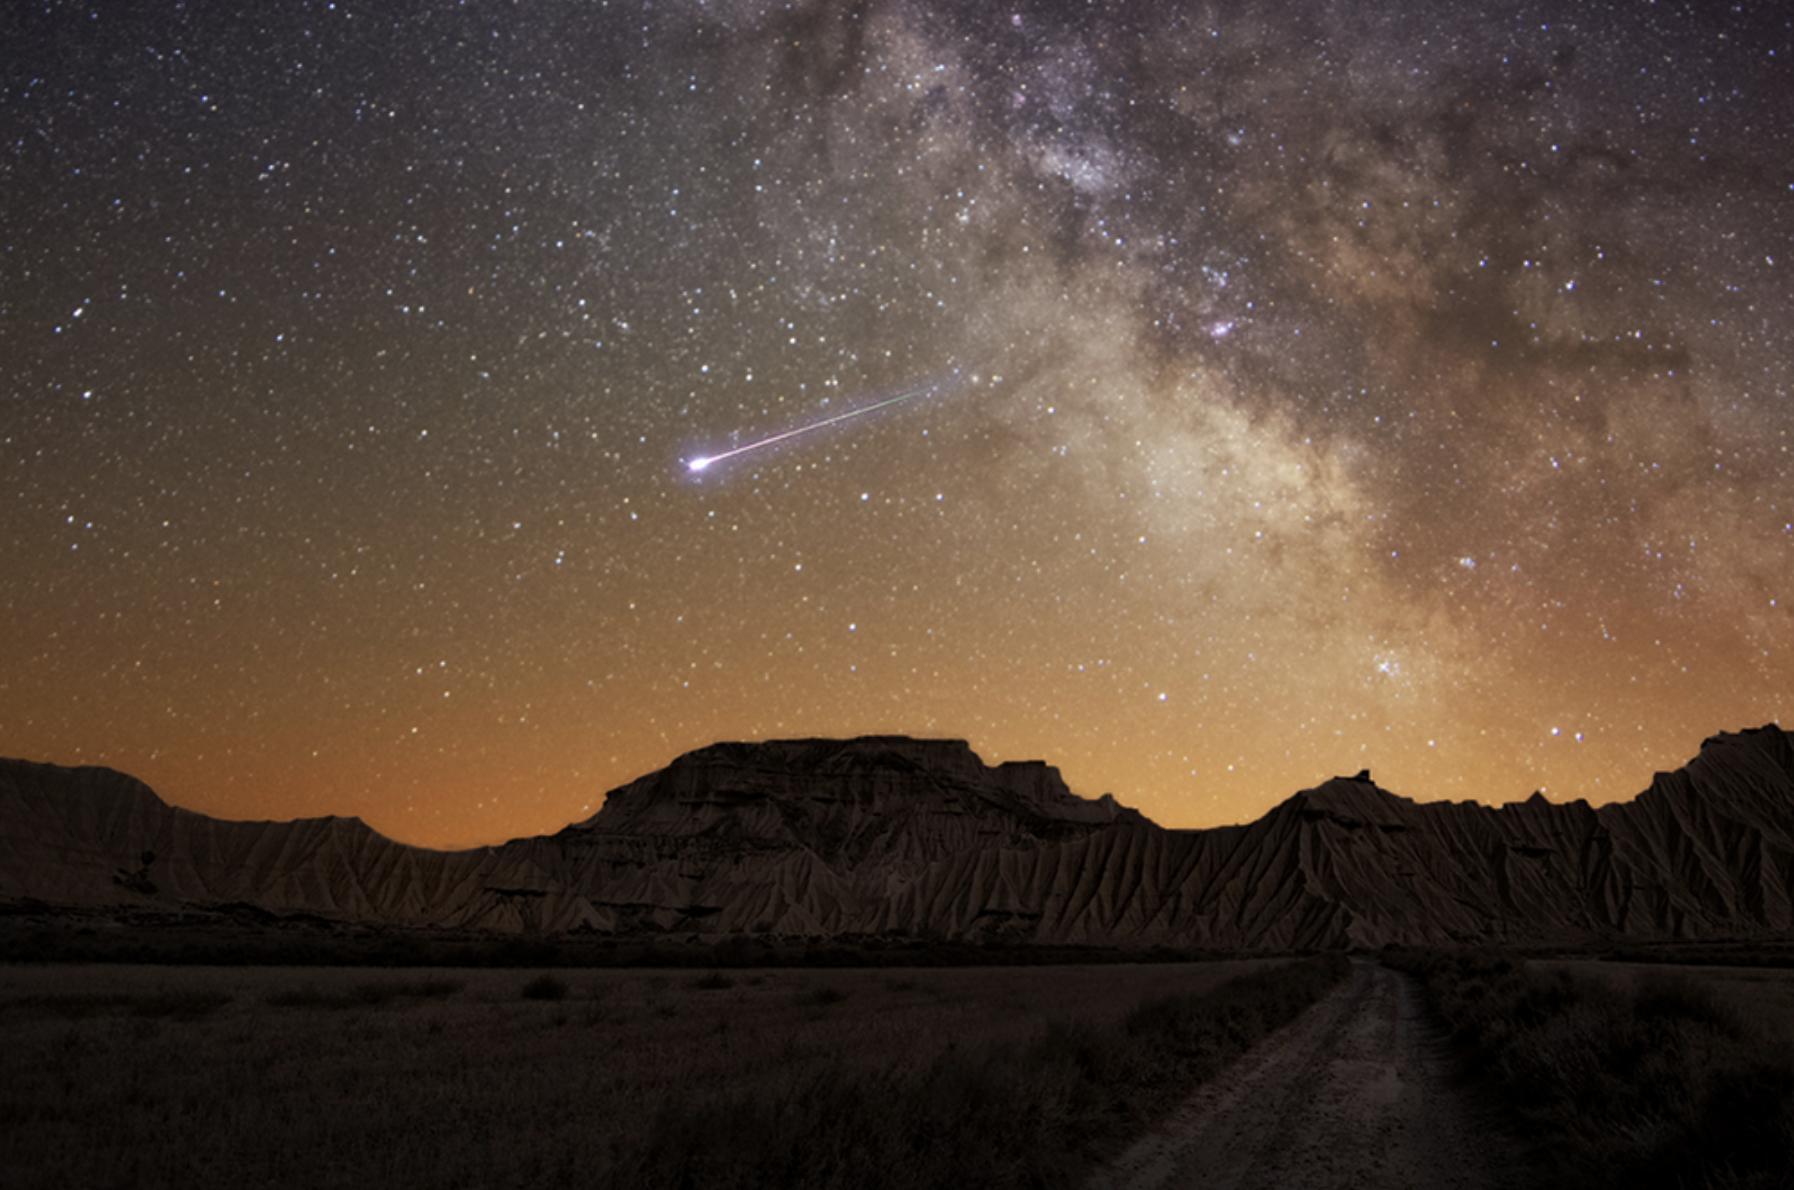 Фото © Elysium Space, Inc.